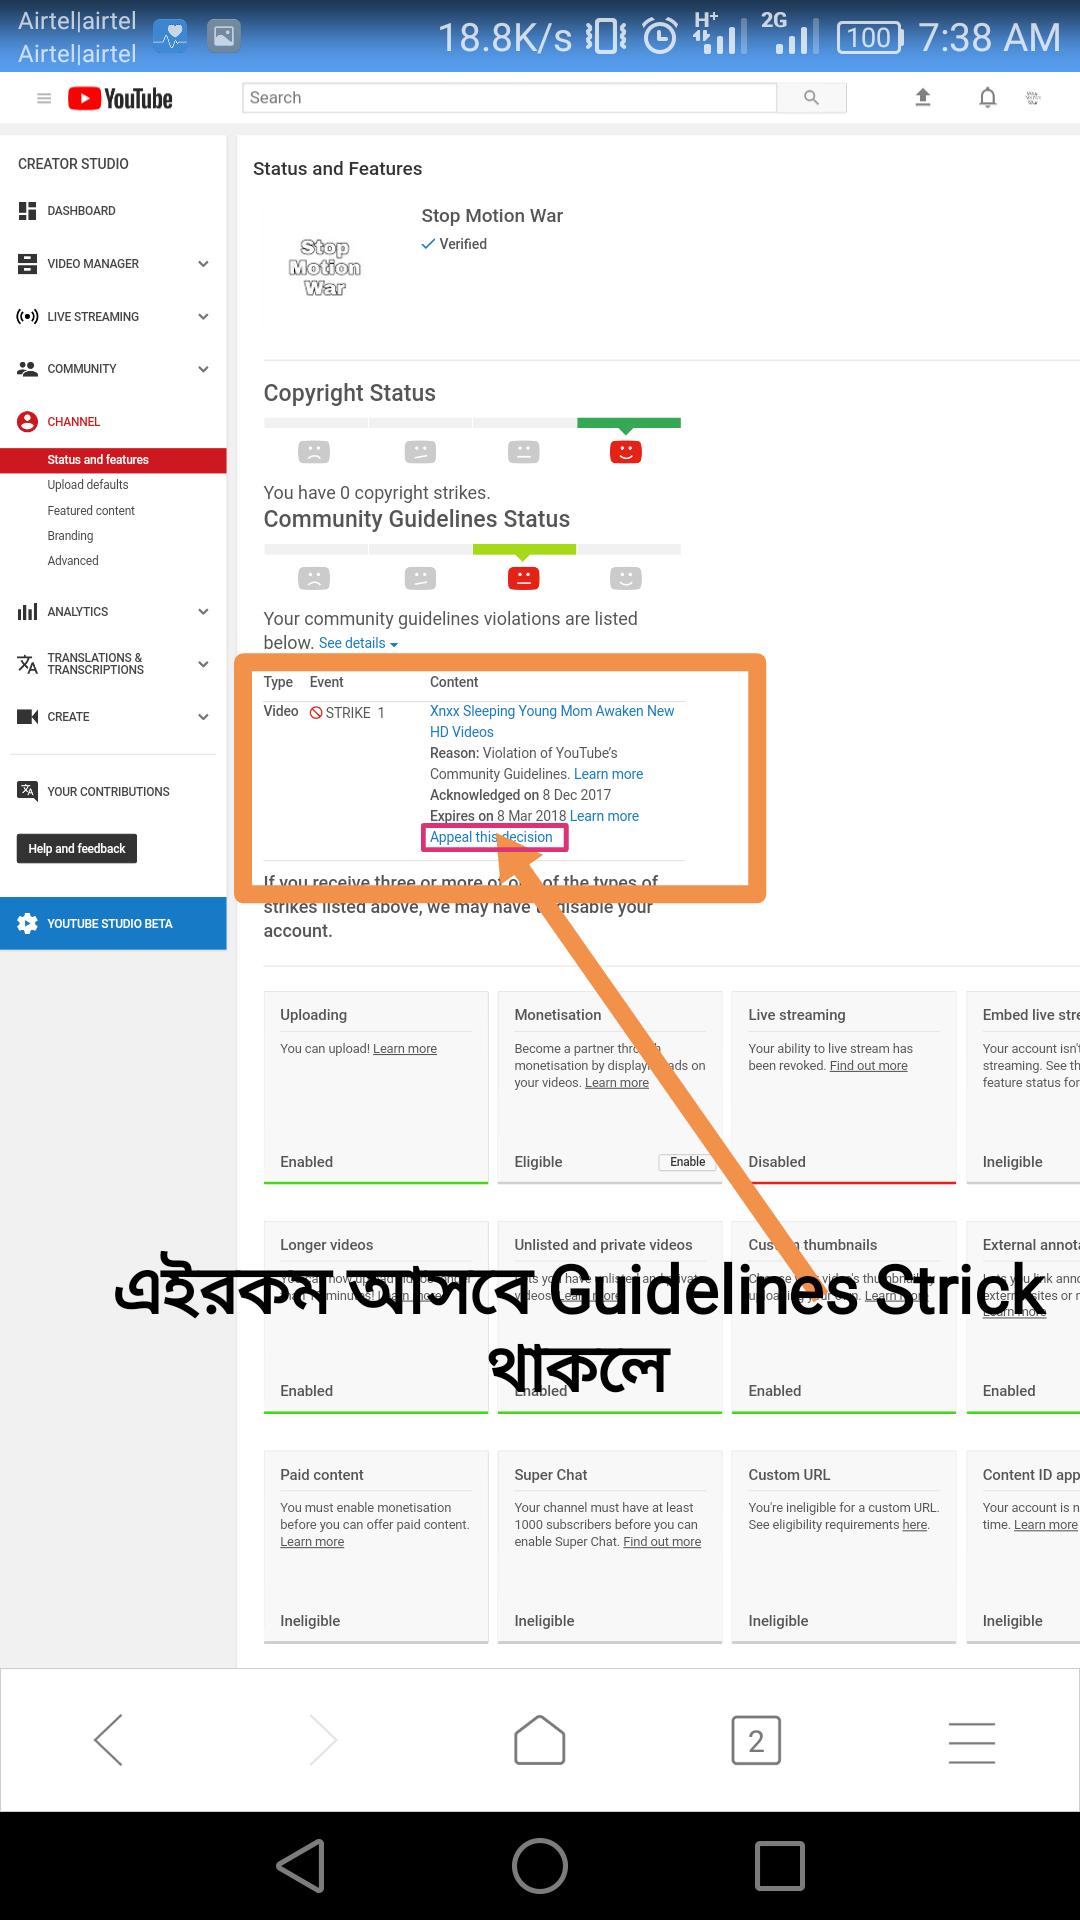 Youtube এ কিভাবে Community Guidelines Strike মুছে ফেলবেন বা Appeal করবেন।